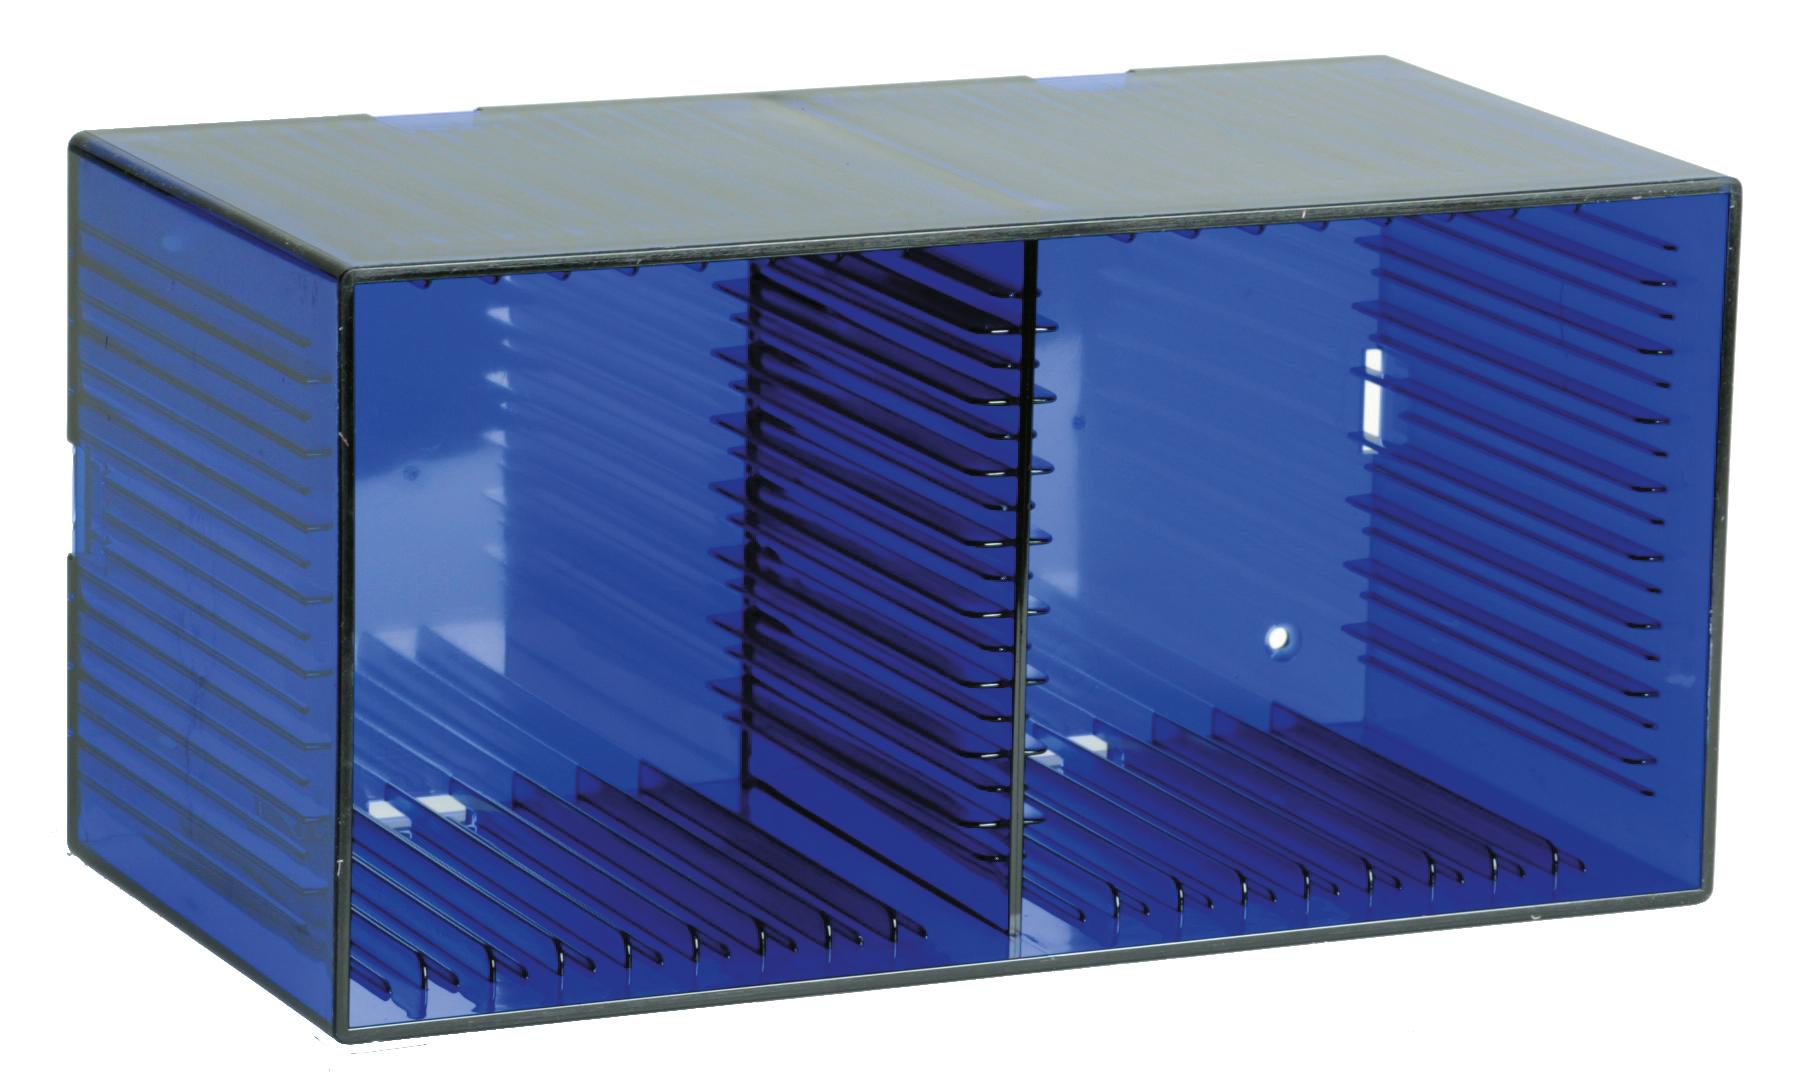 cd box tango transparent blue for 18 cds media archiving knosti. Black Bedroom Furniture Sets. Home Design Ideas